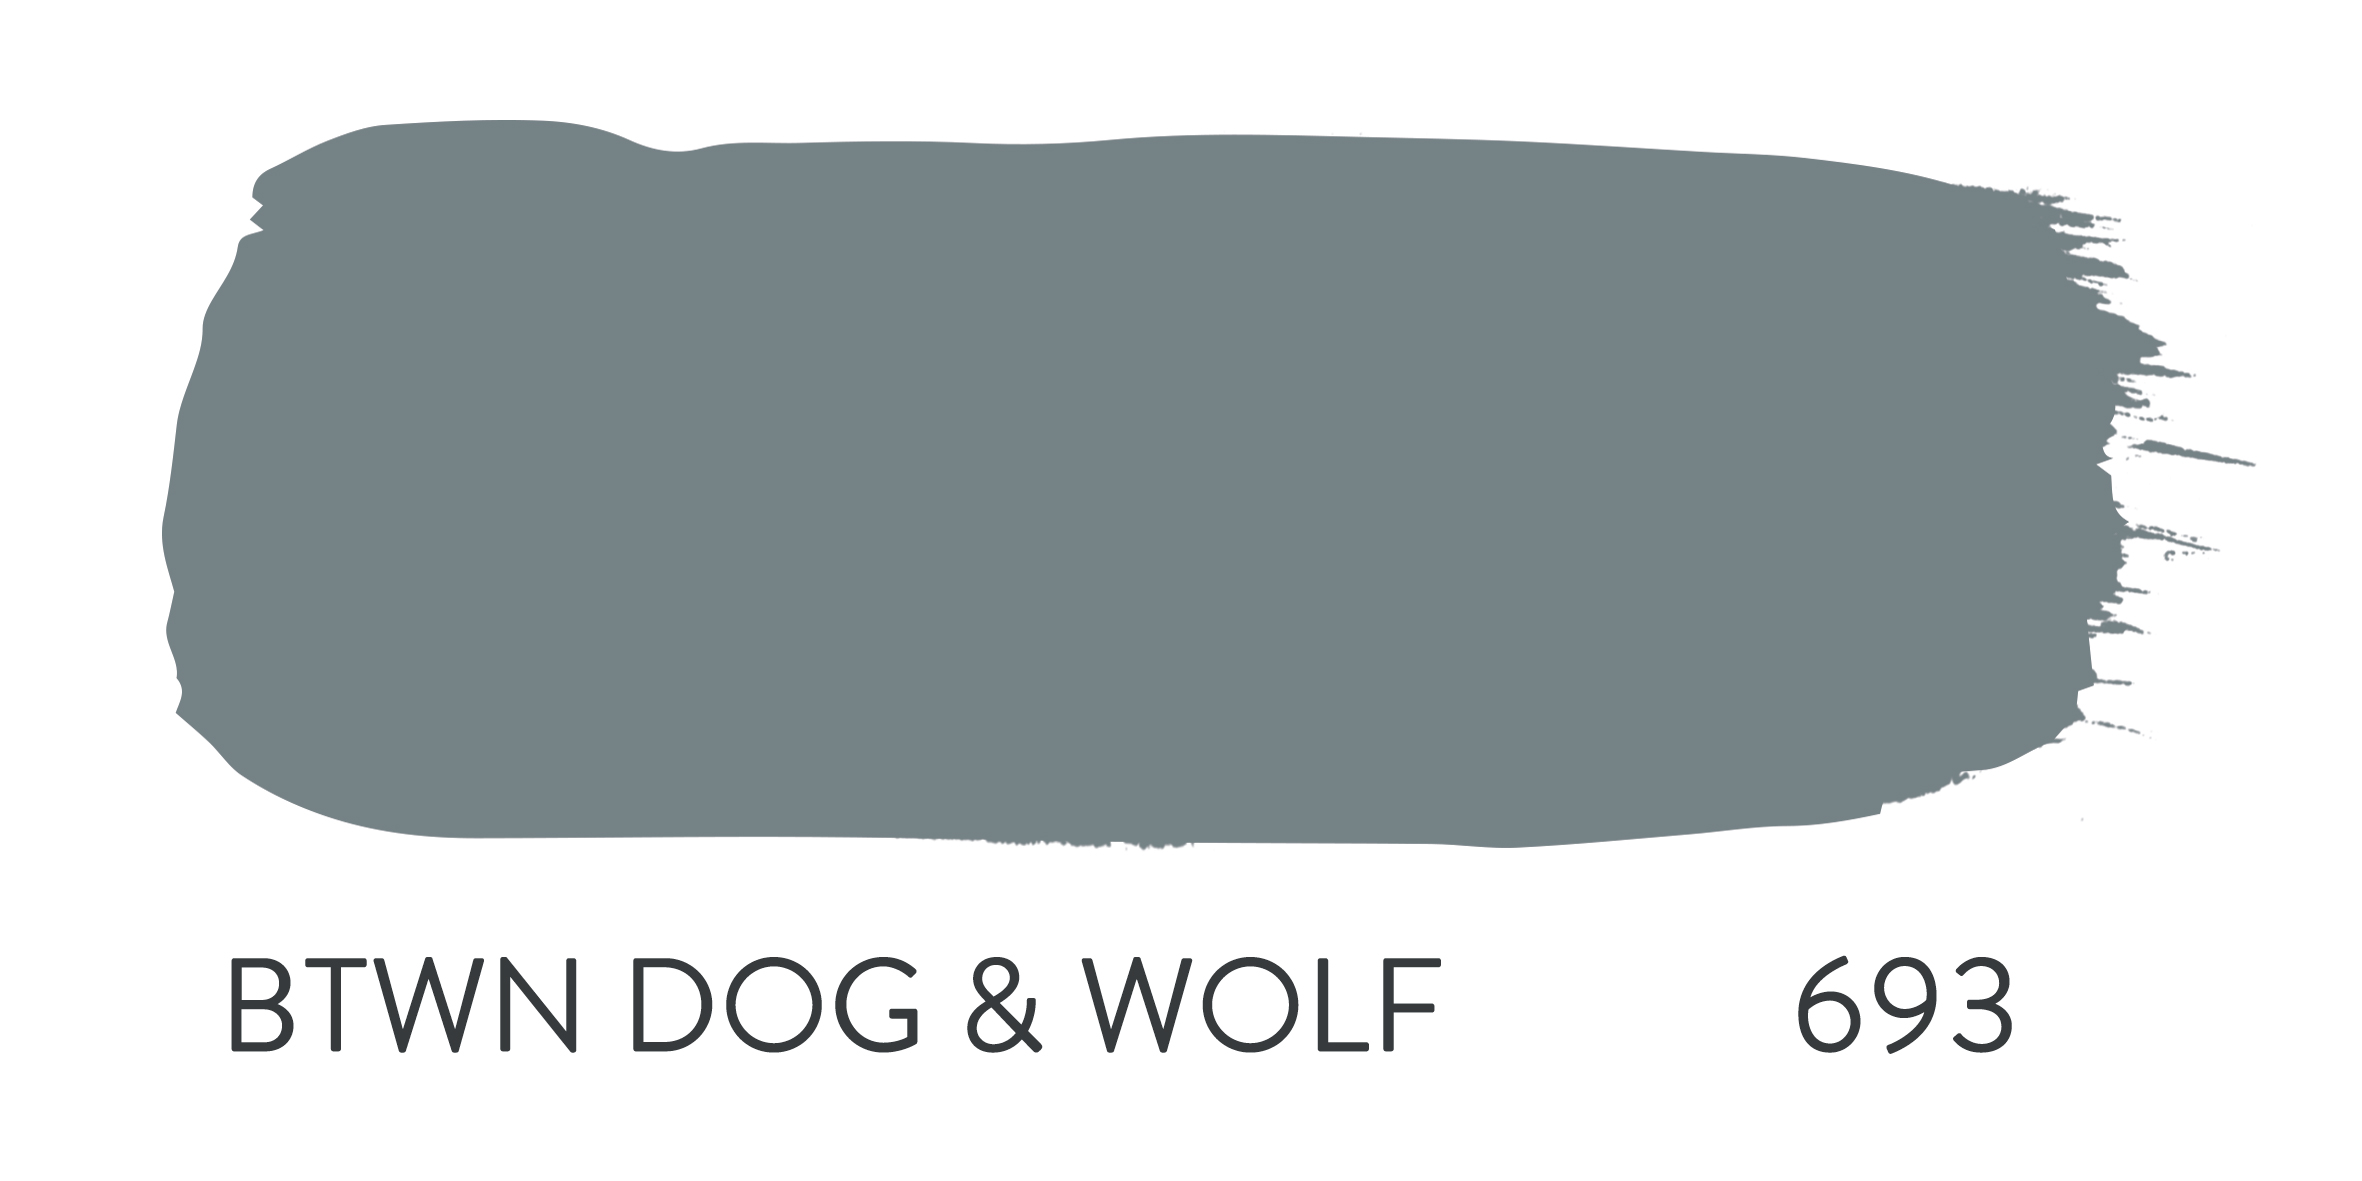 BTWN DOG & WOLF 693.jpg